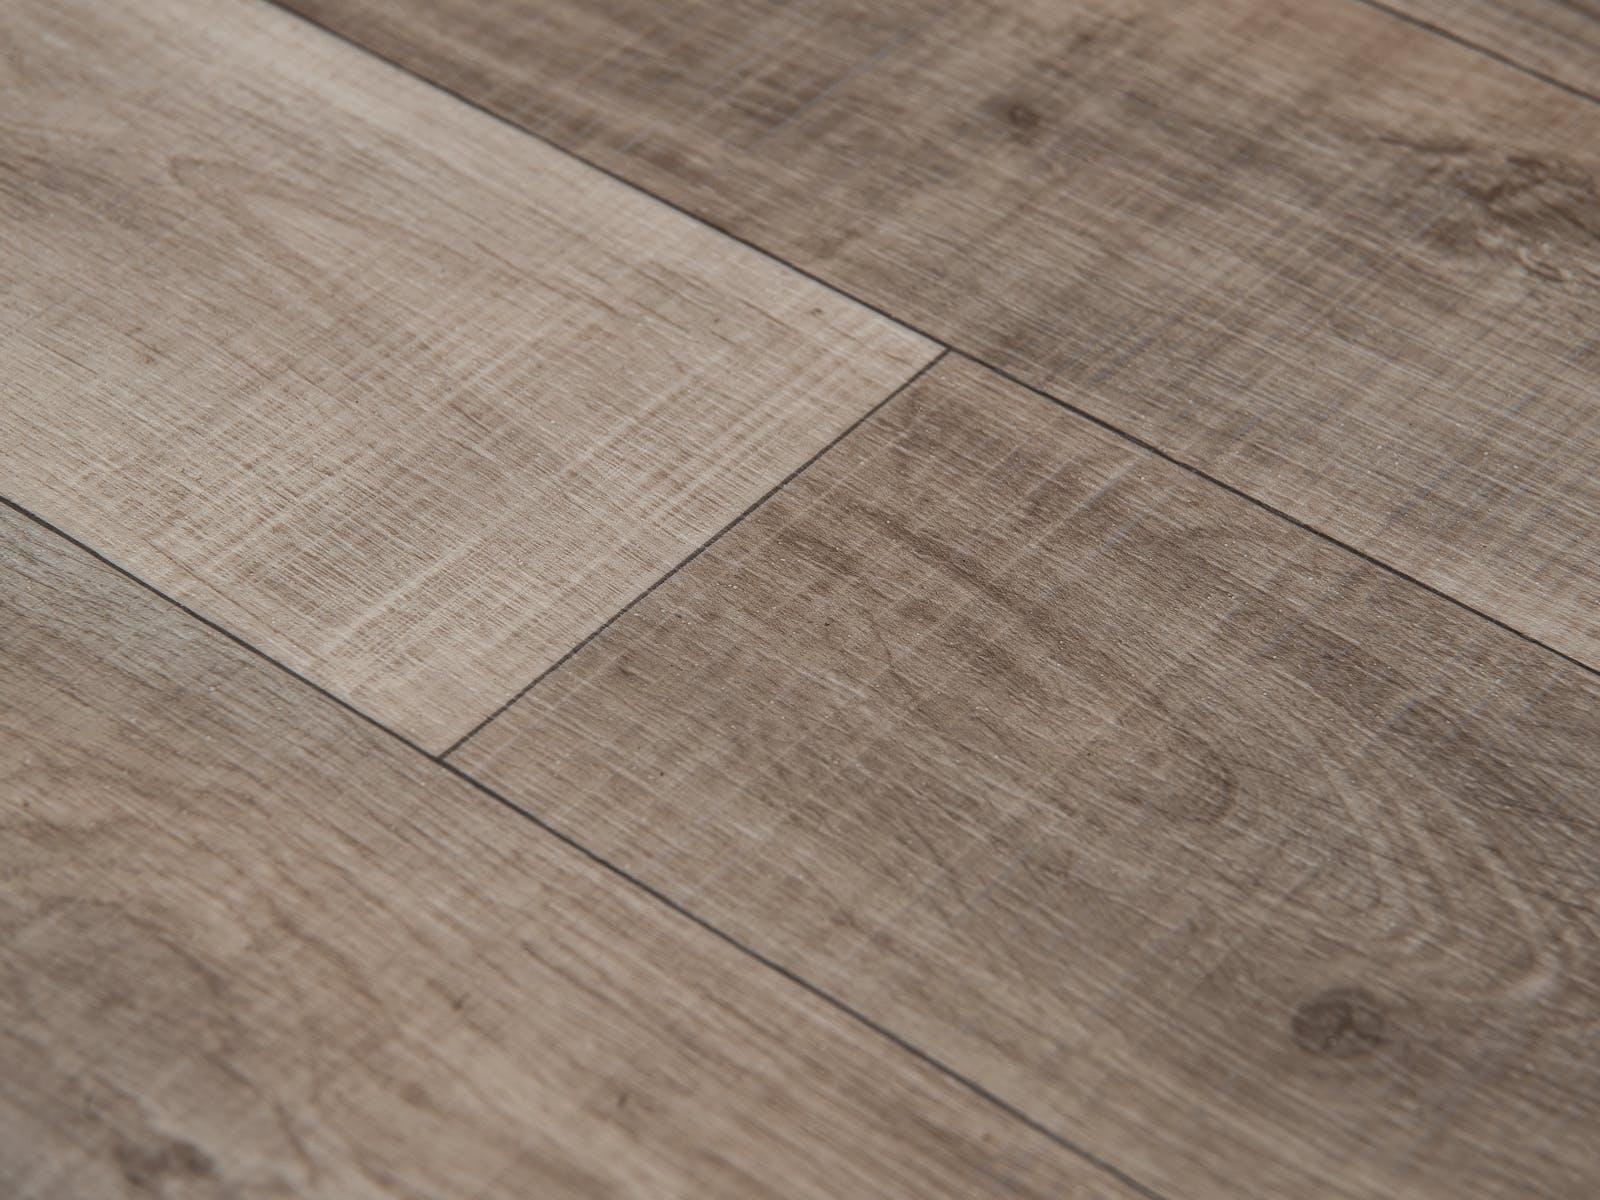 HR flooring